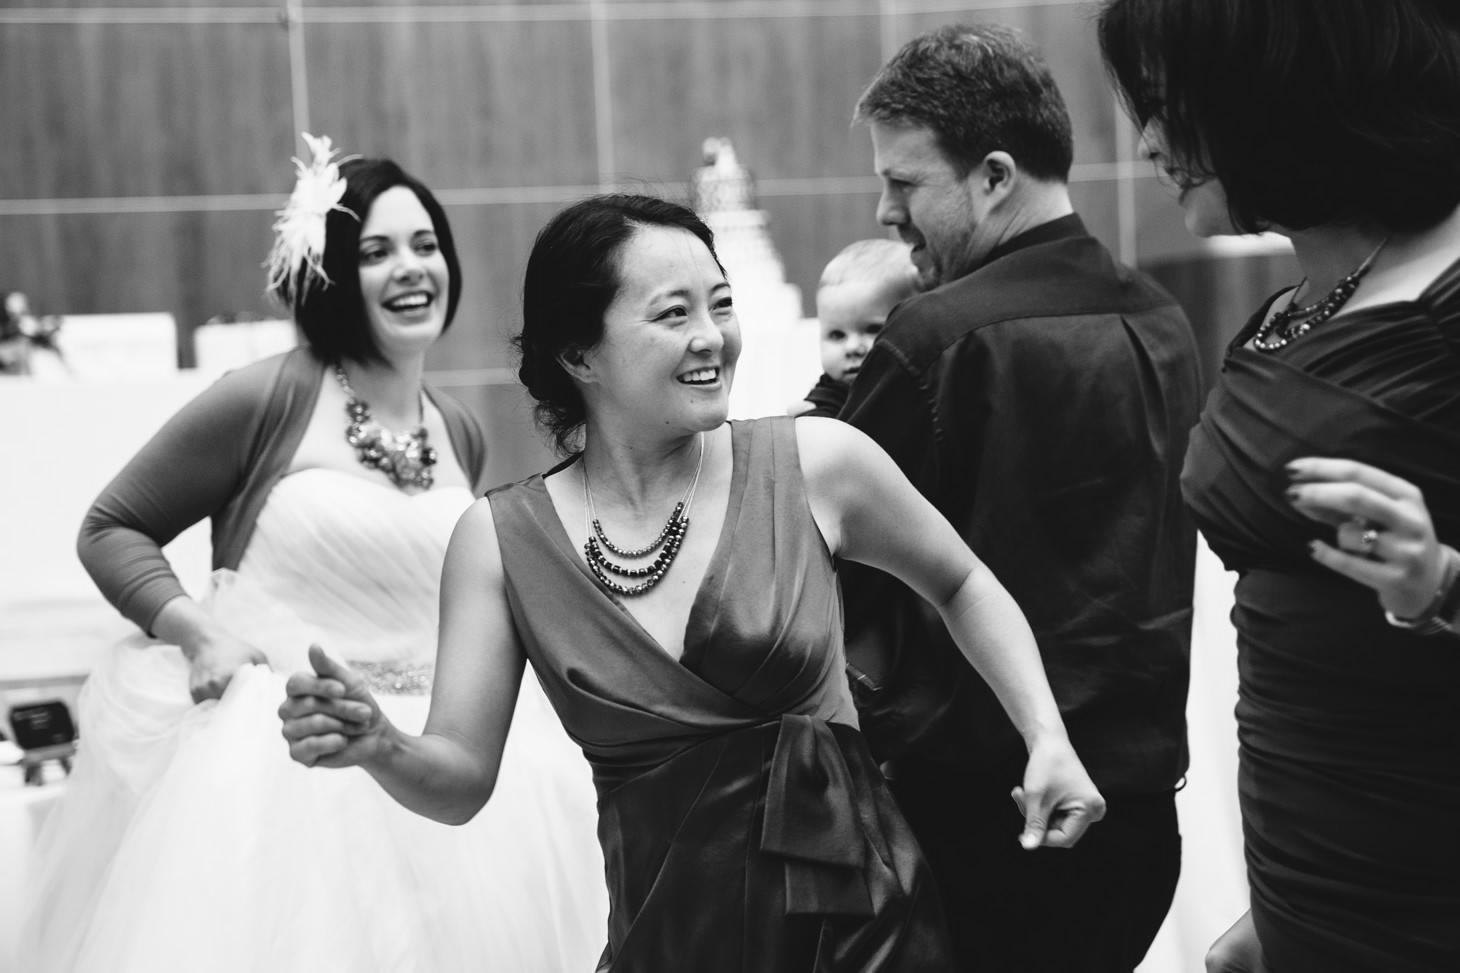 059-nyc-wedding-photographer-smitten-chickens-nj-montclair-art-museum.jpg